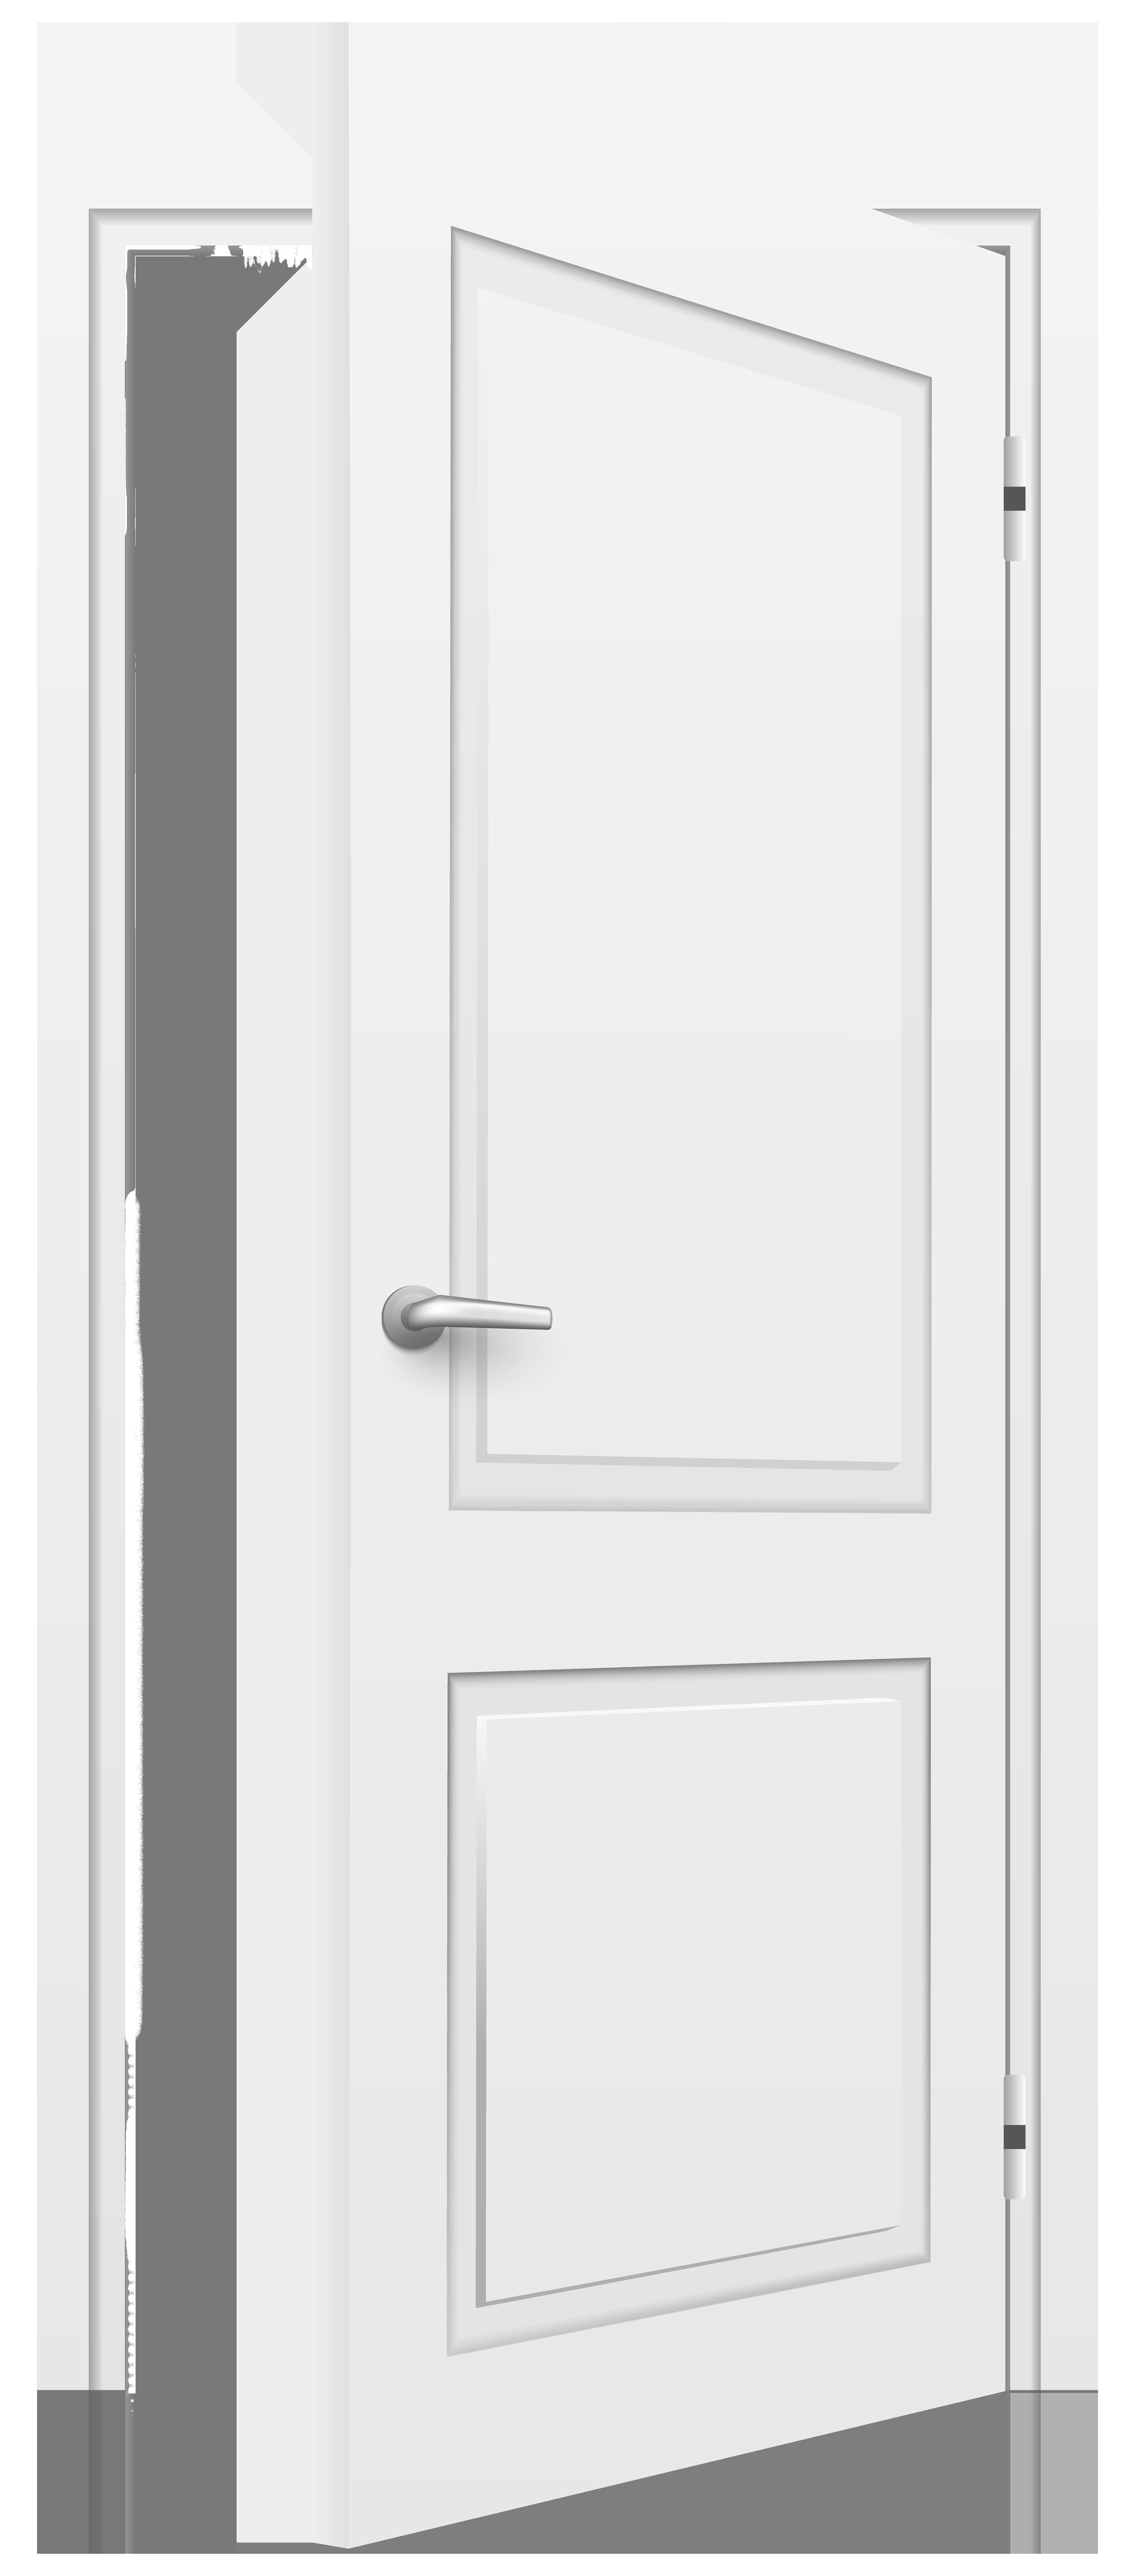 House door clipart clipart black and white download Open Door White PNG Clip Art - Best WEB Clipart clipart black and white download